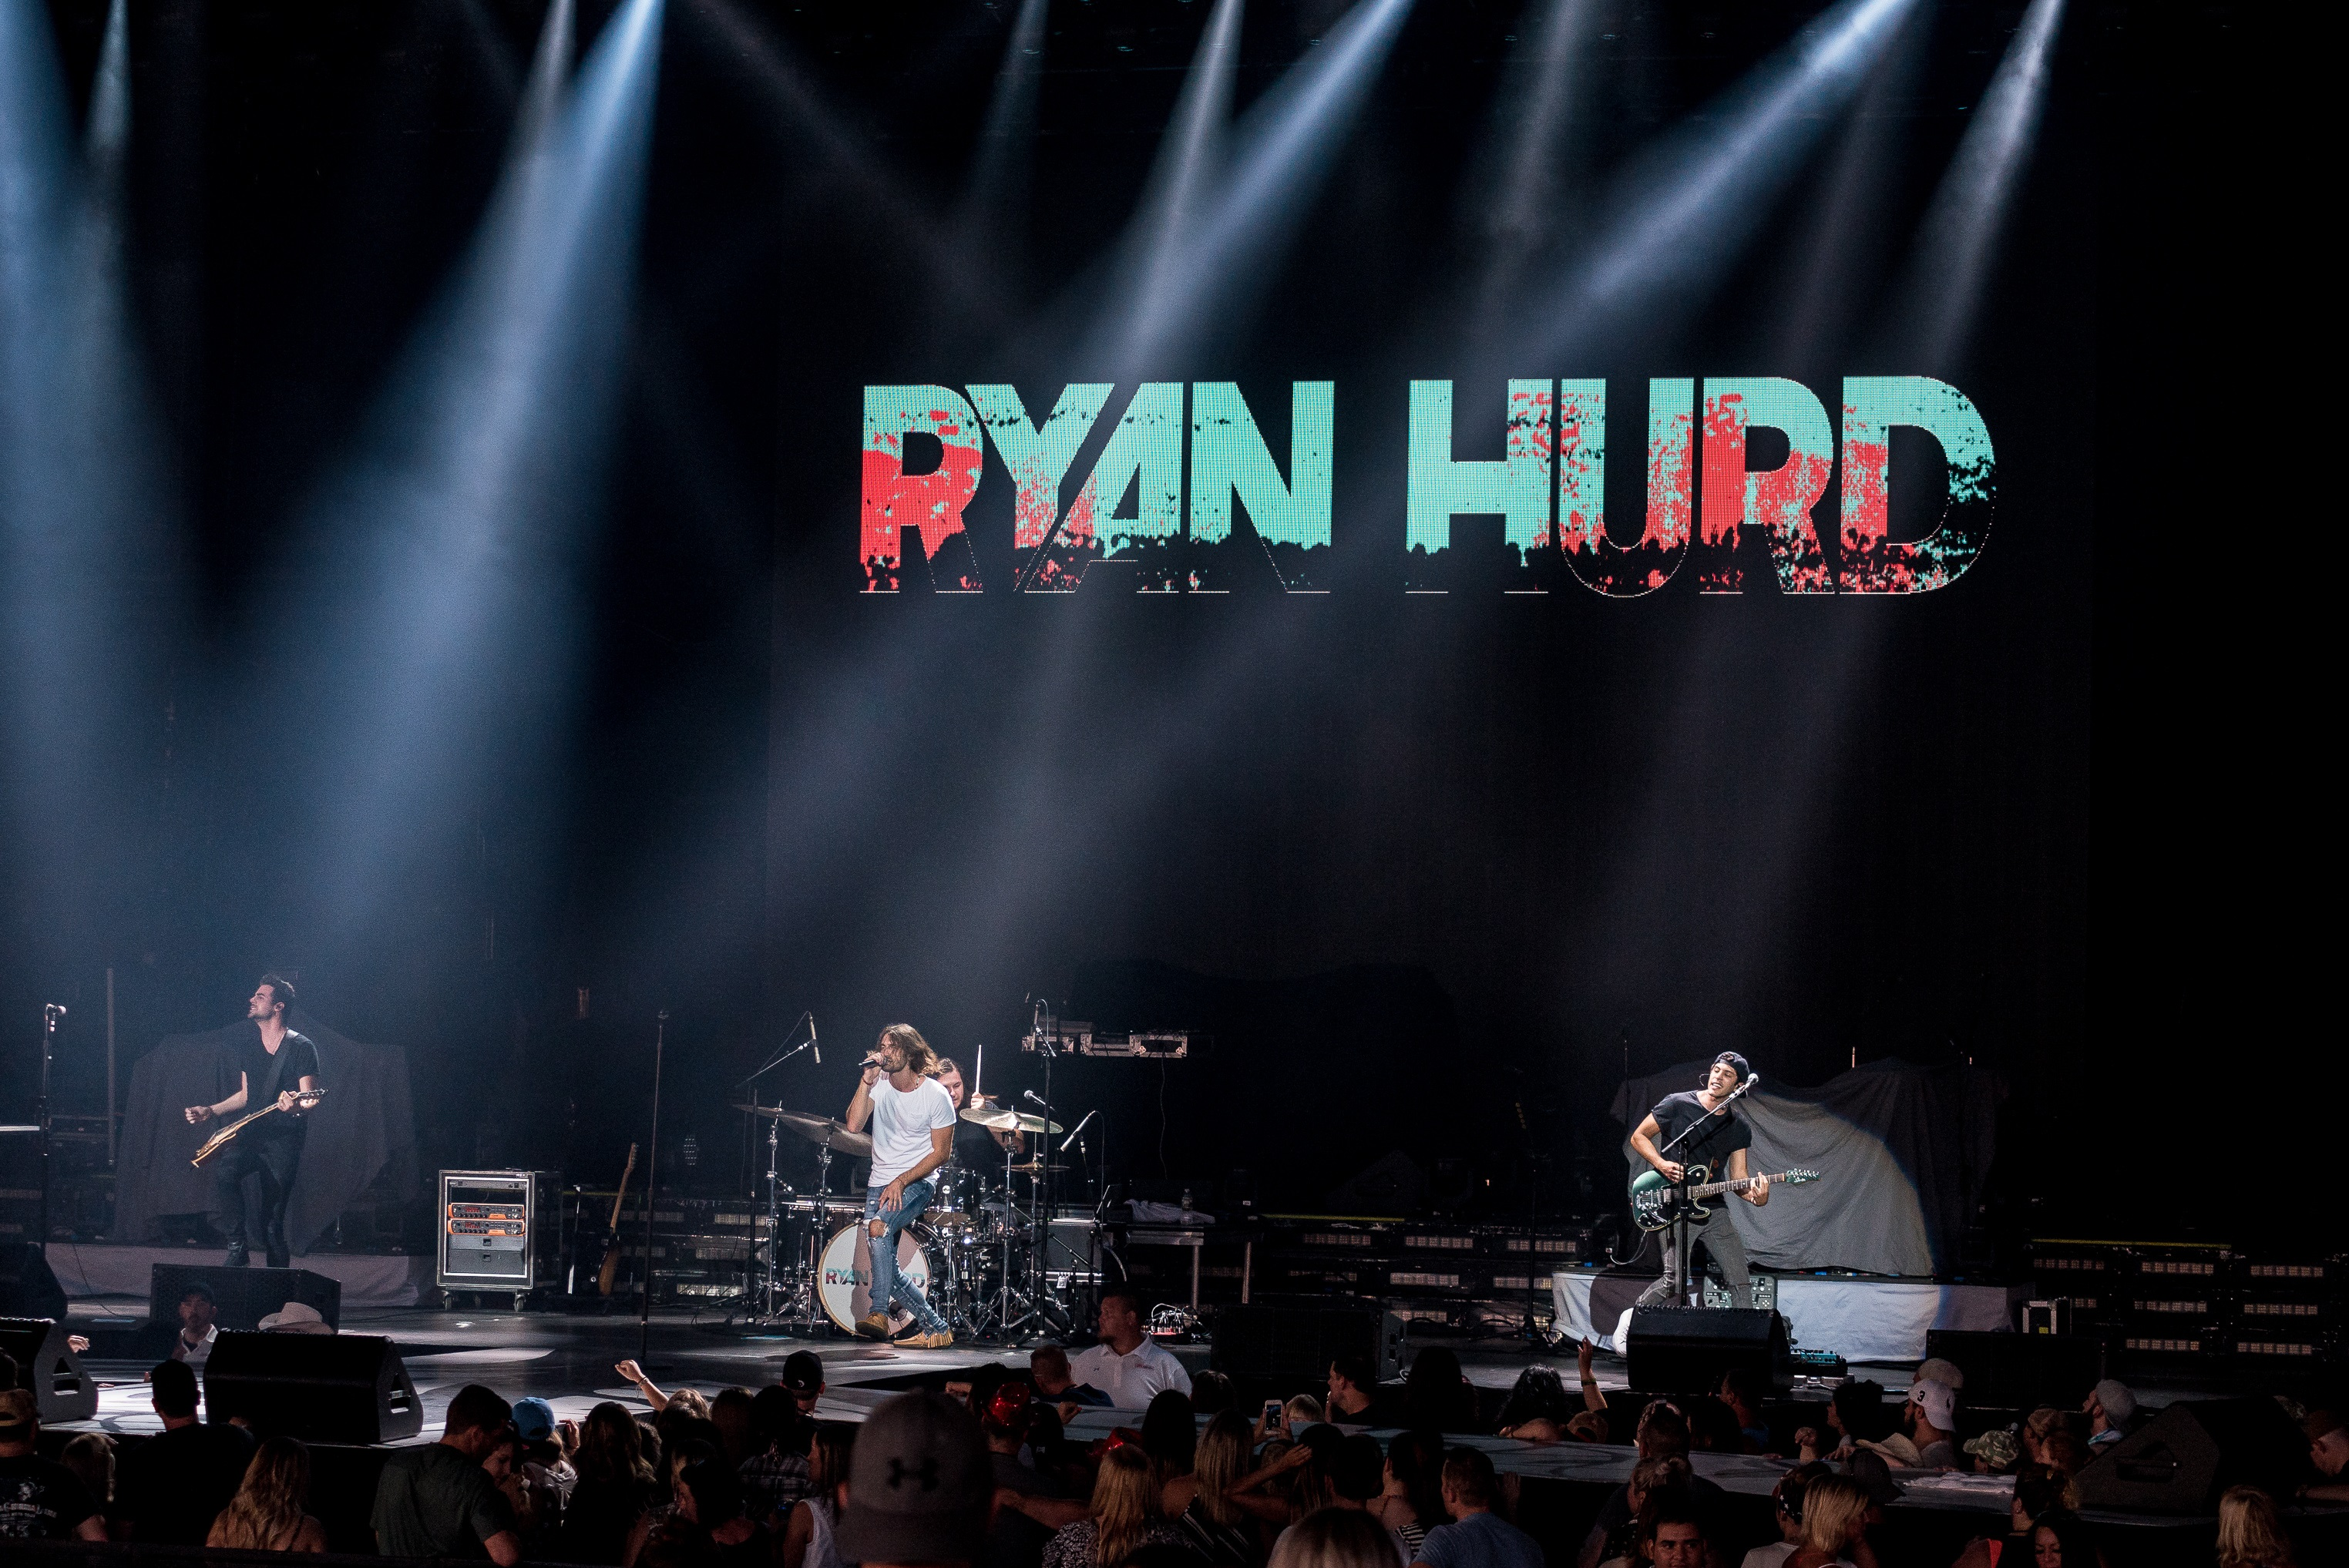 Ryan Hurd; Photo by Andrew Wendowski/Sounds Like Nashville